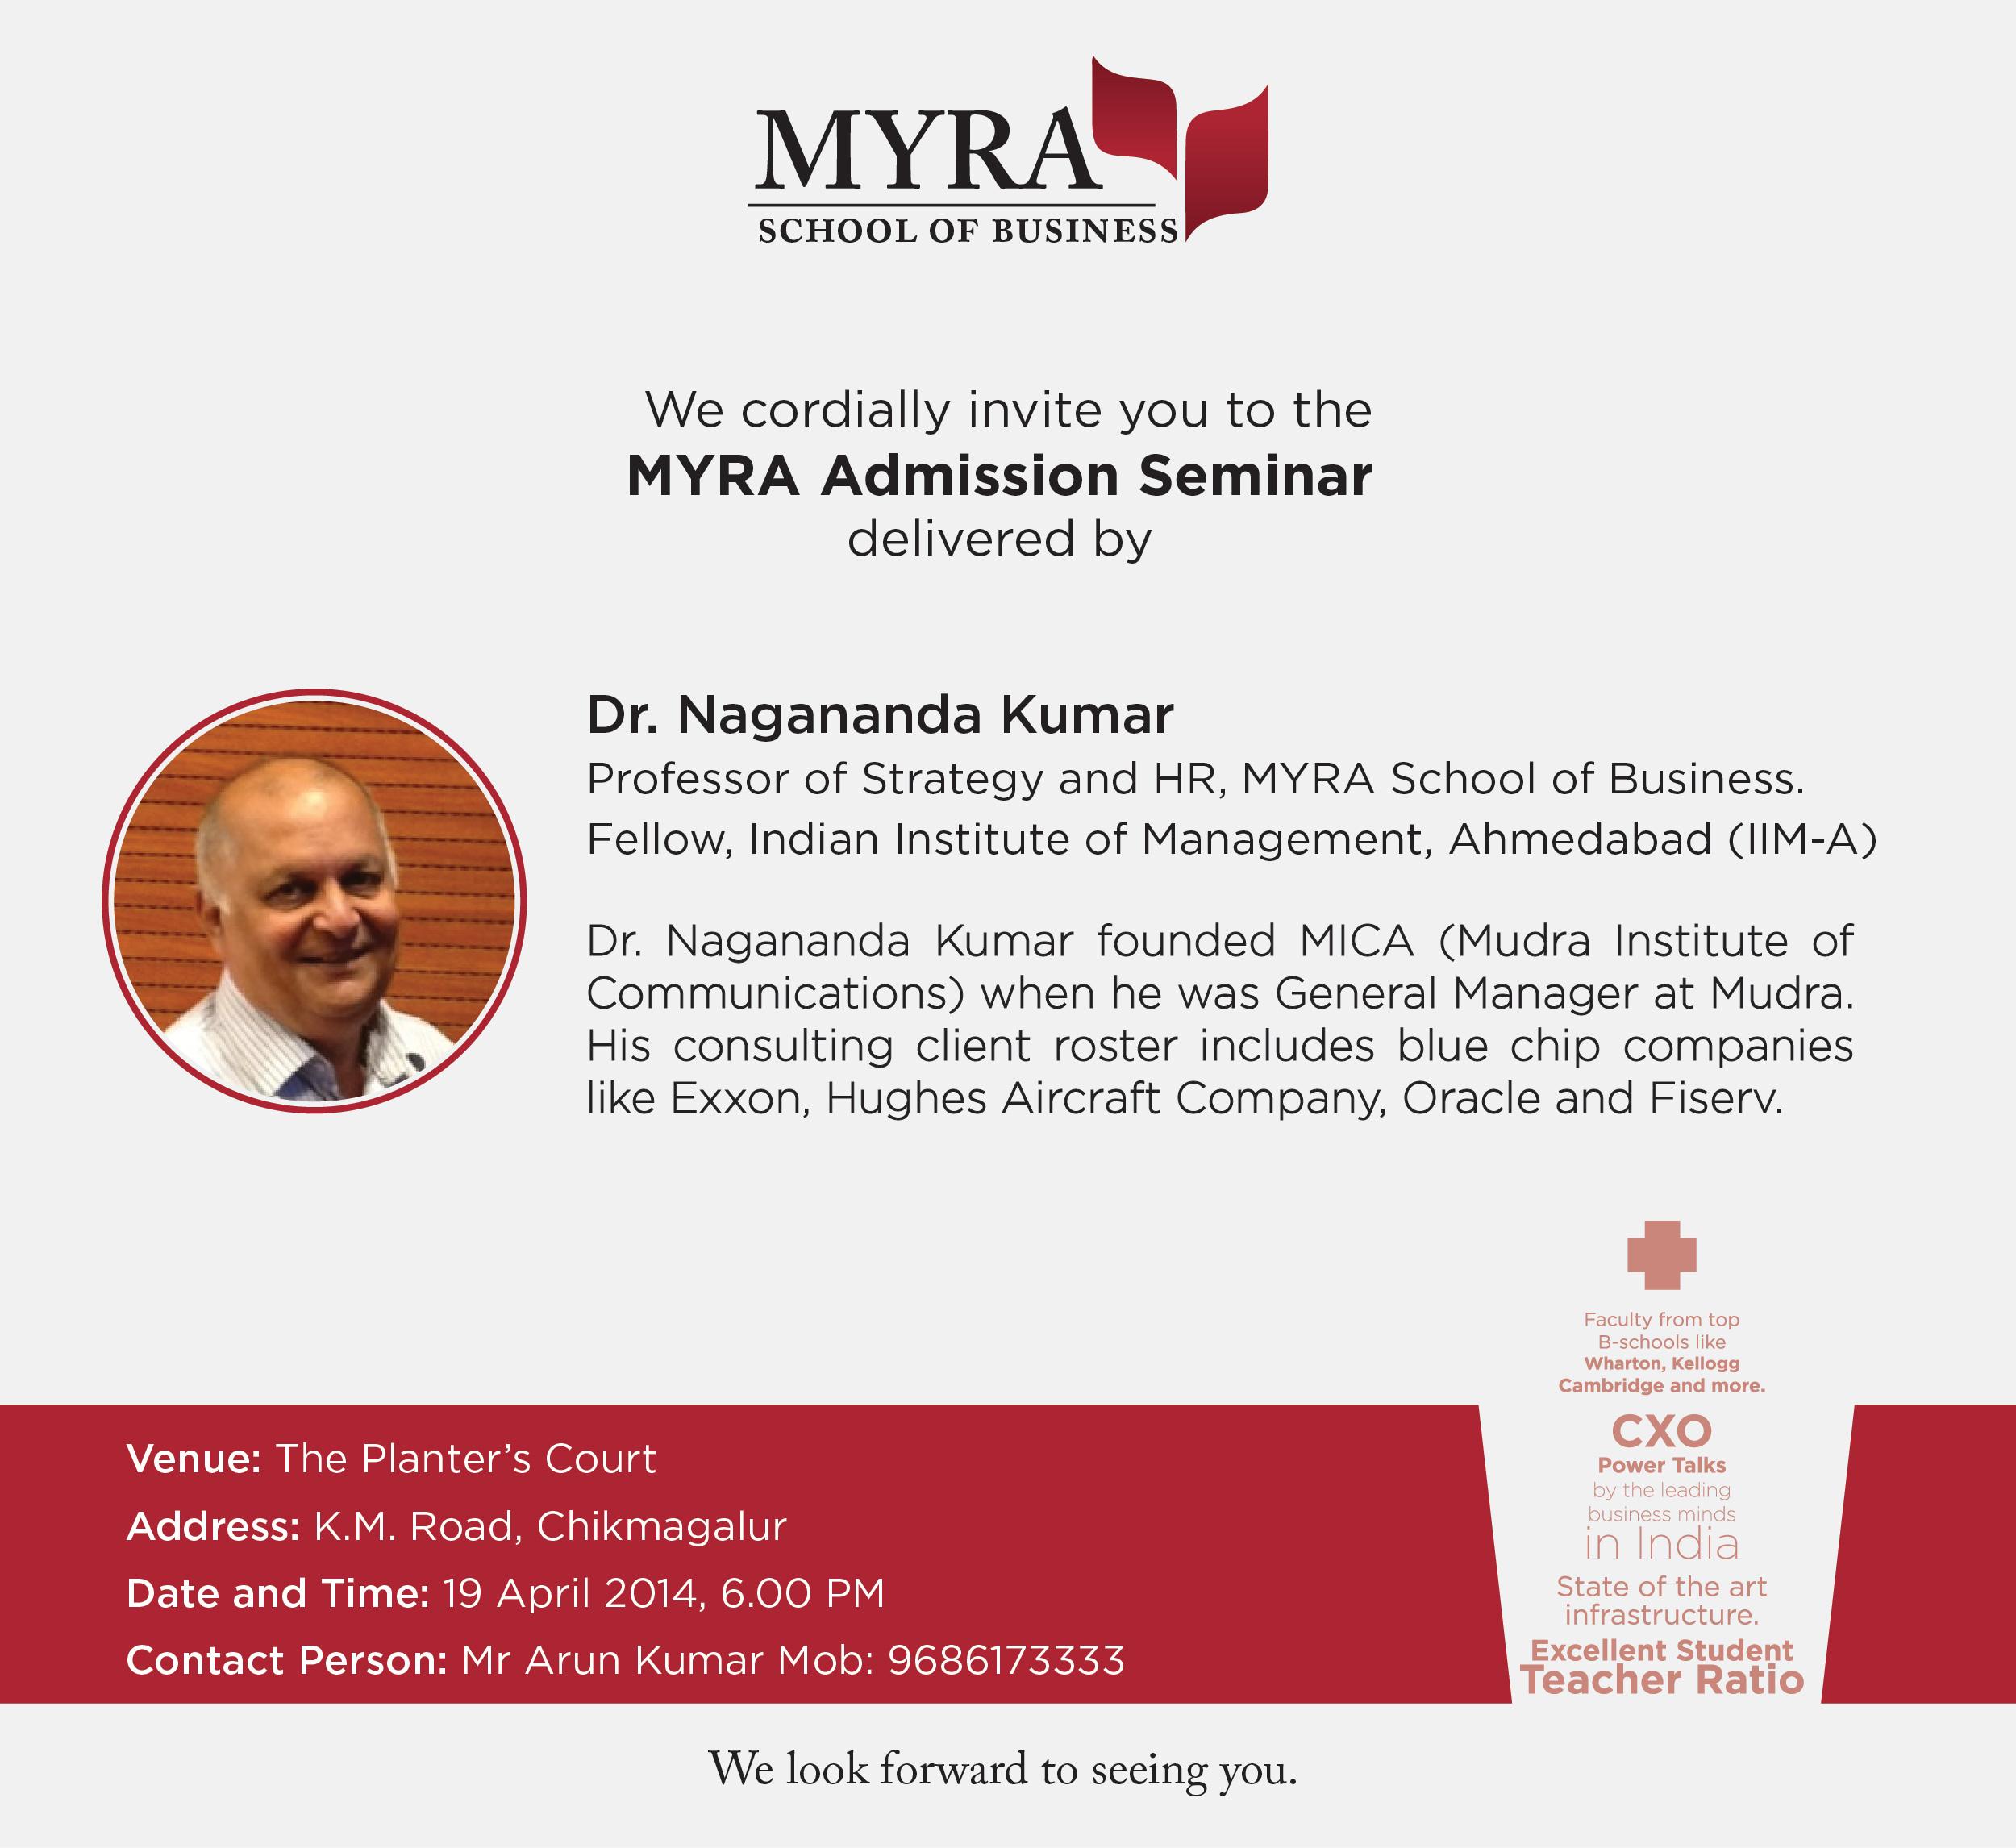 MYRA-AdmissionSeminar-Chikmagalur_invite